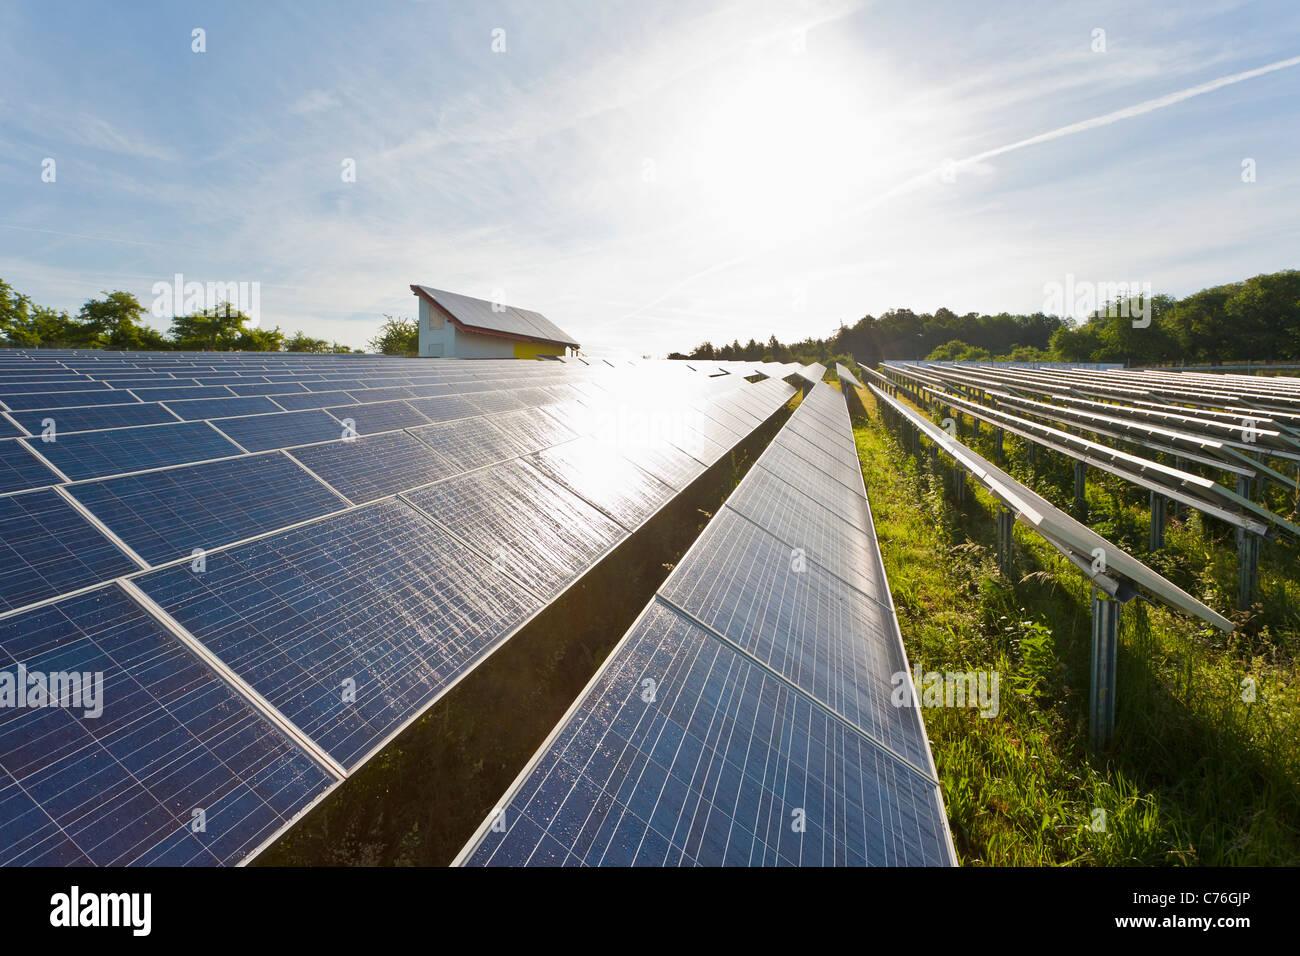 SOLAR PANELS, SOLAR MODULS, SOLAR PARK, PHOTOVOLTAICS, SOLAR ELECTRICITY, NEAR WINNENDEN, BADEN-WURTTEMBERG, GERMANY - Stock Image